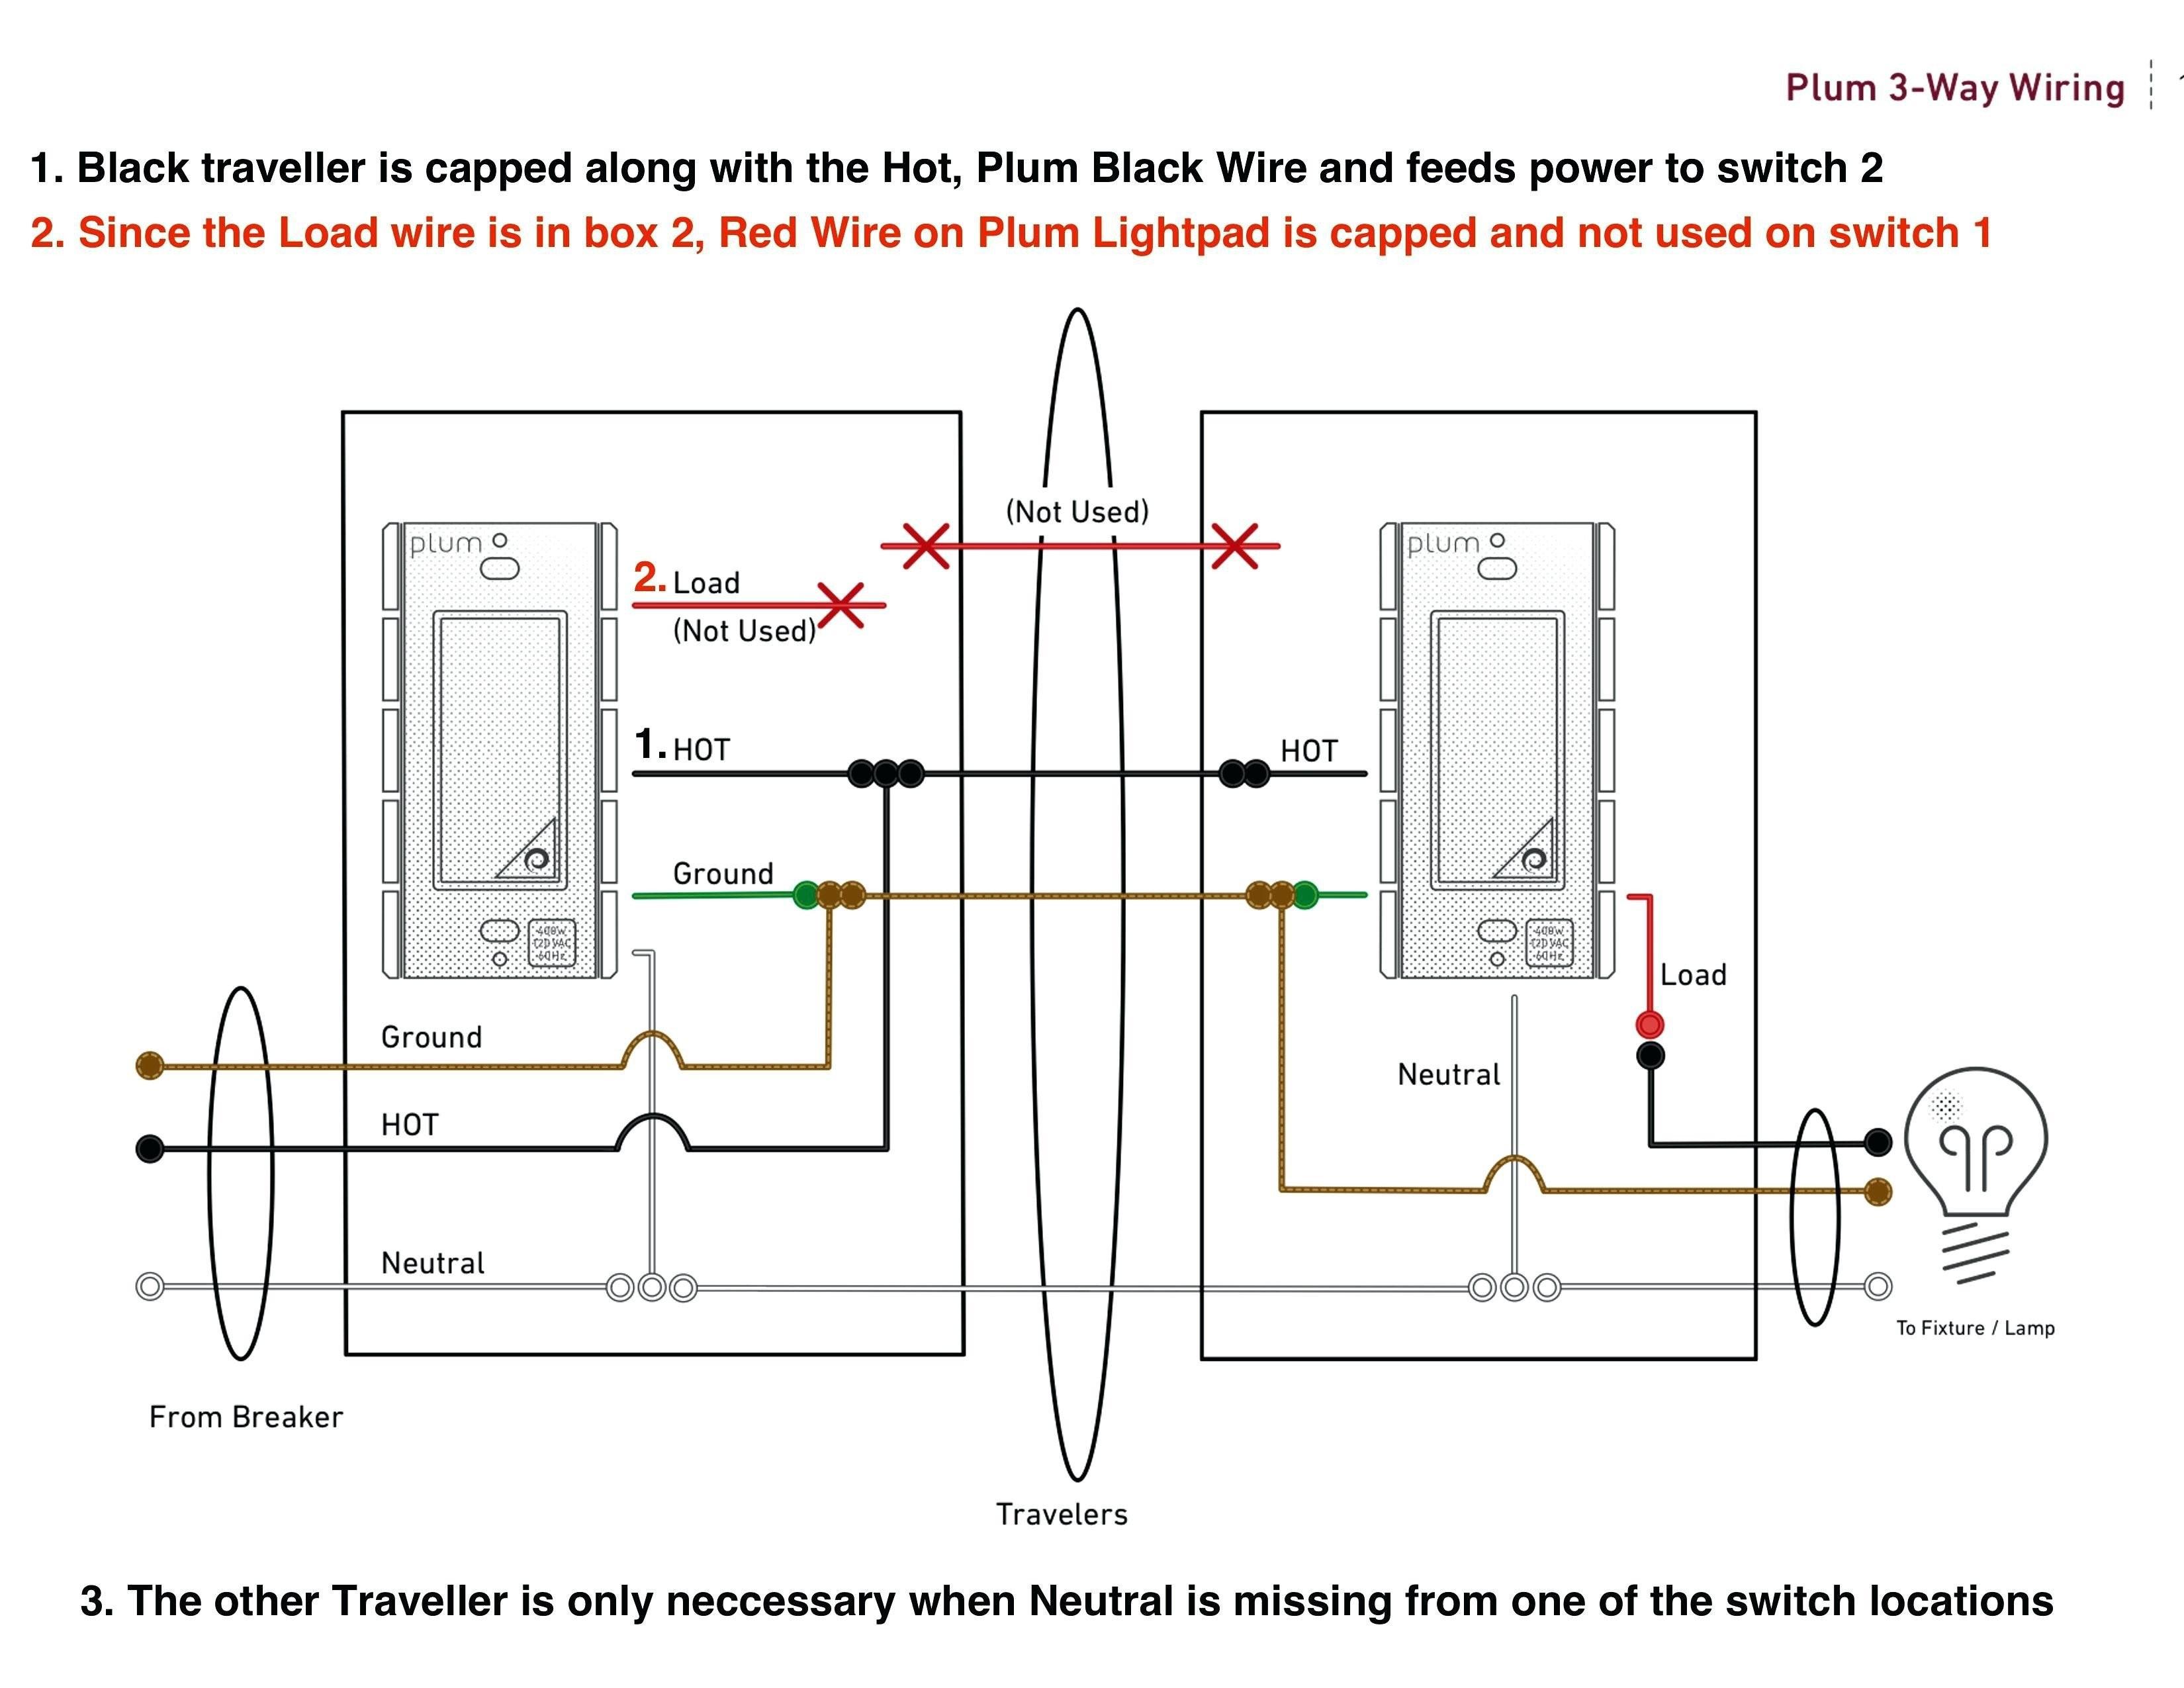 Zing Ear Ze-208S Wiring Diagram | Electrick Wiring Diagram @co - Zing Ear Ze-208S Wiring Diagram